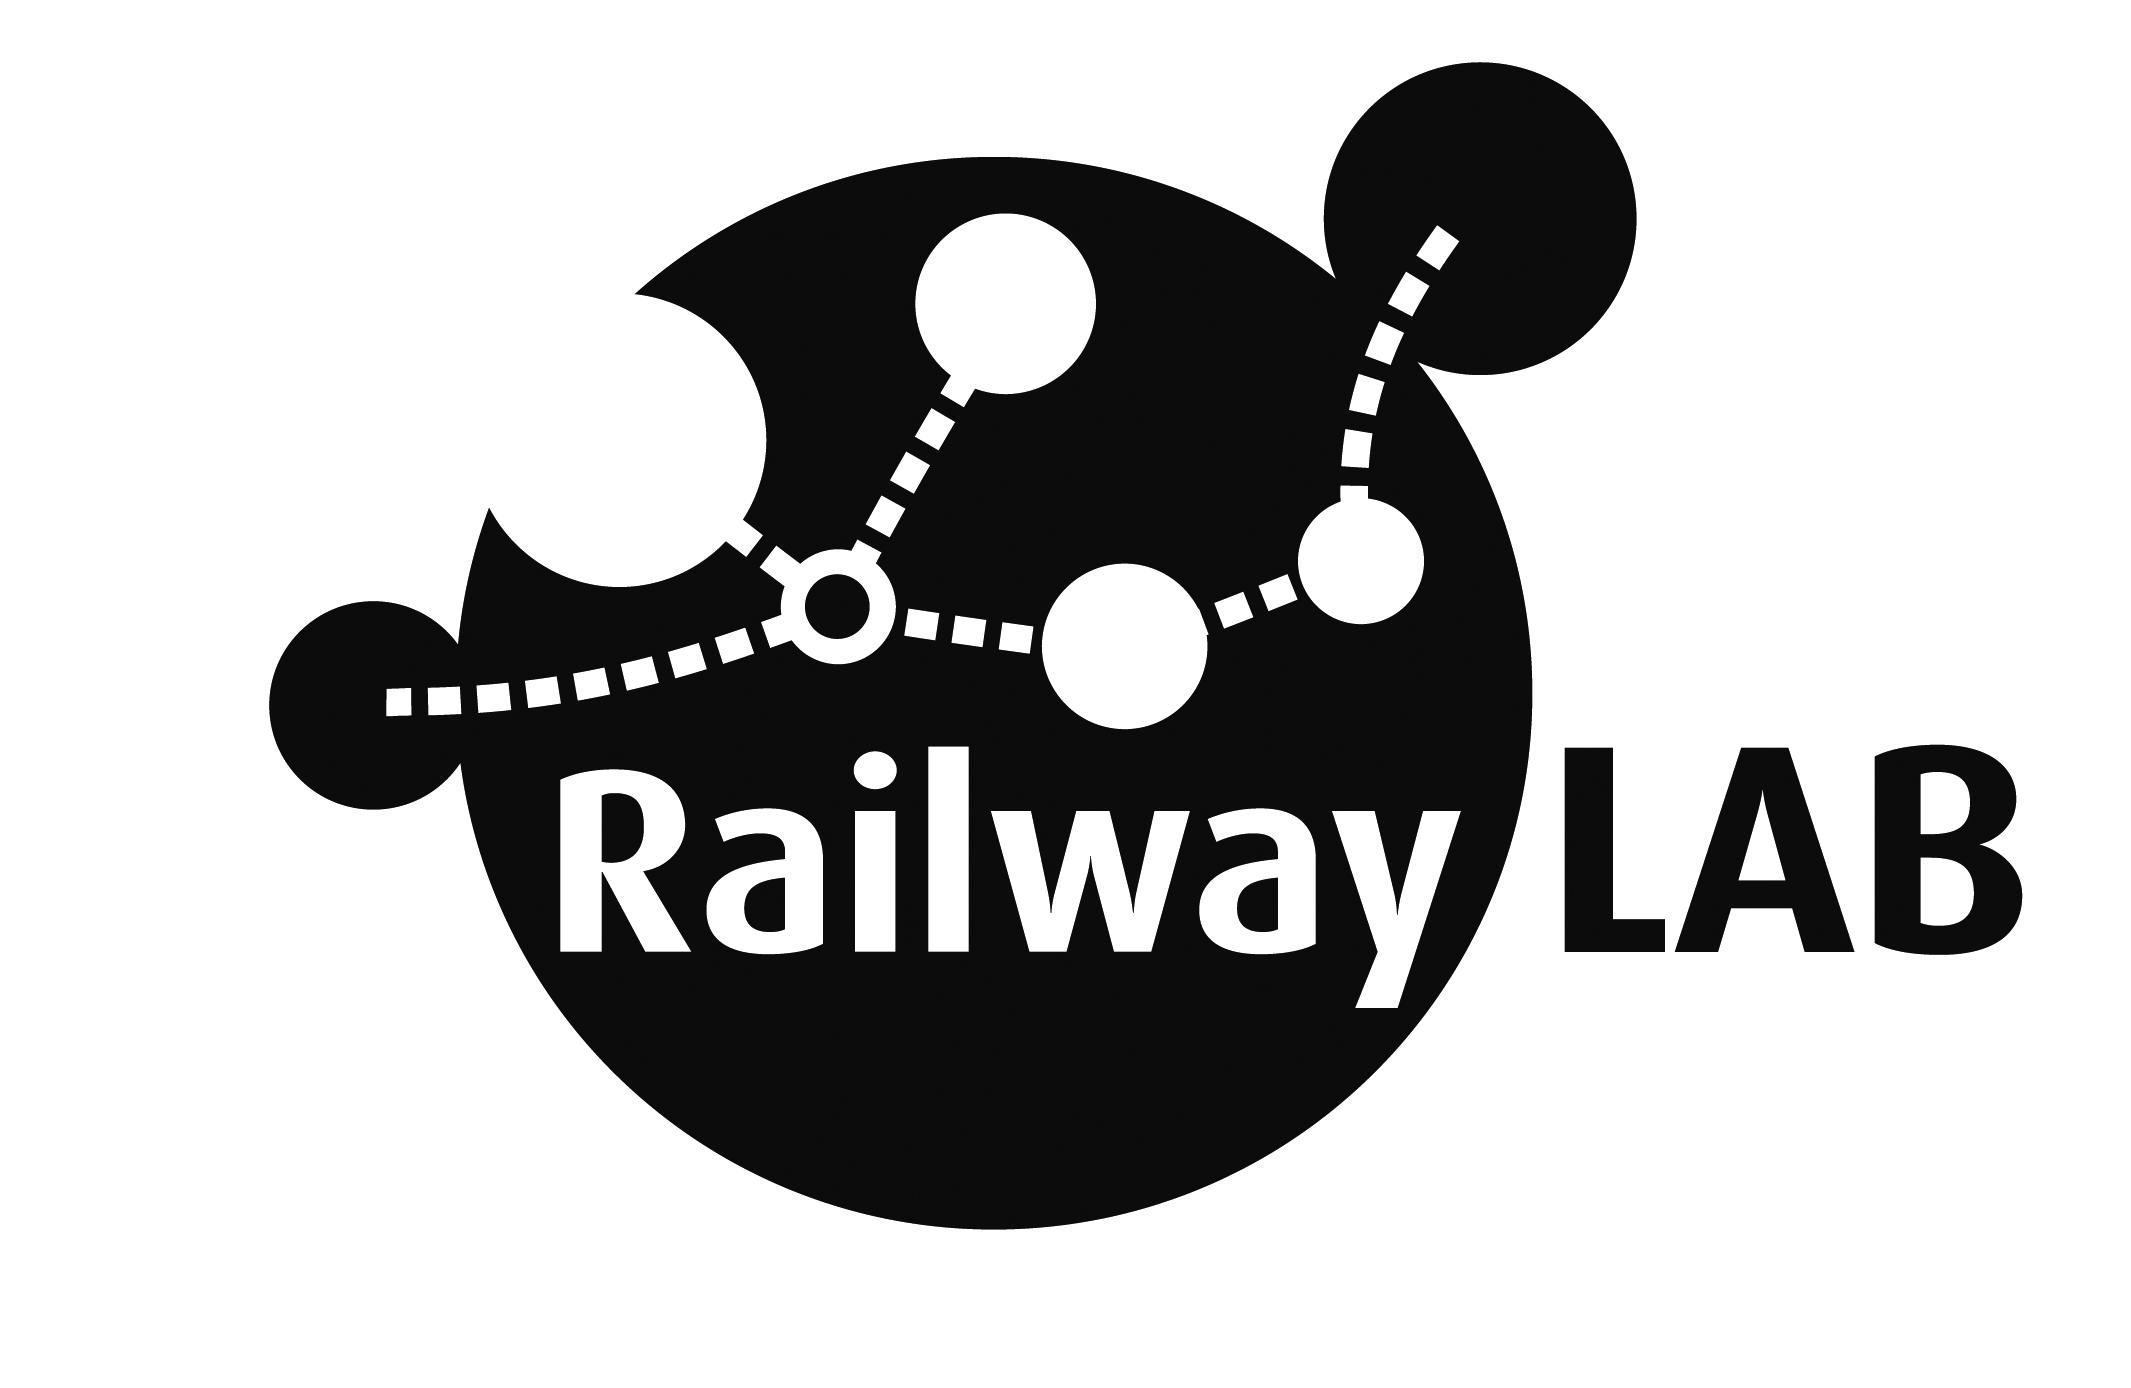 RailwayLAB